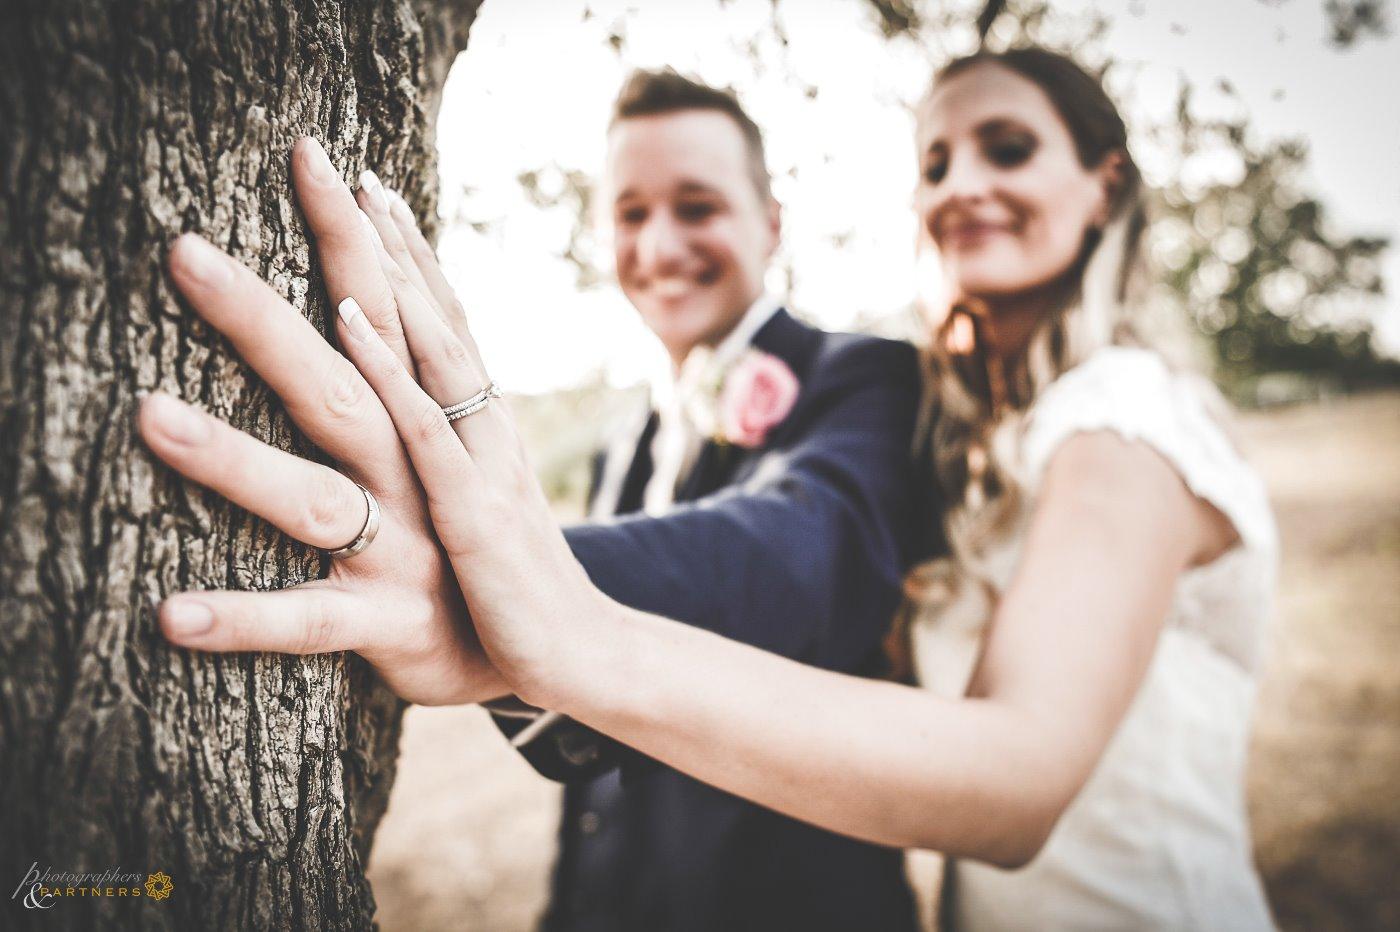 photography_weddings_scarlino_14.jpg